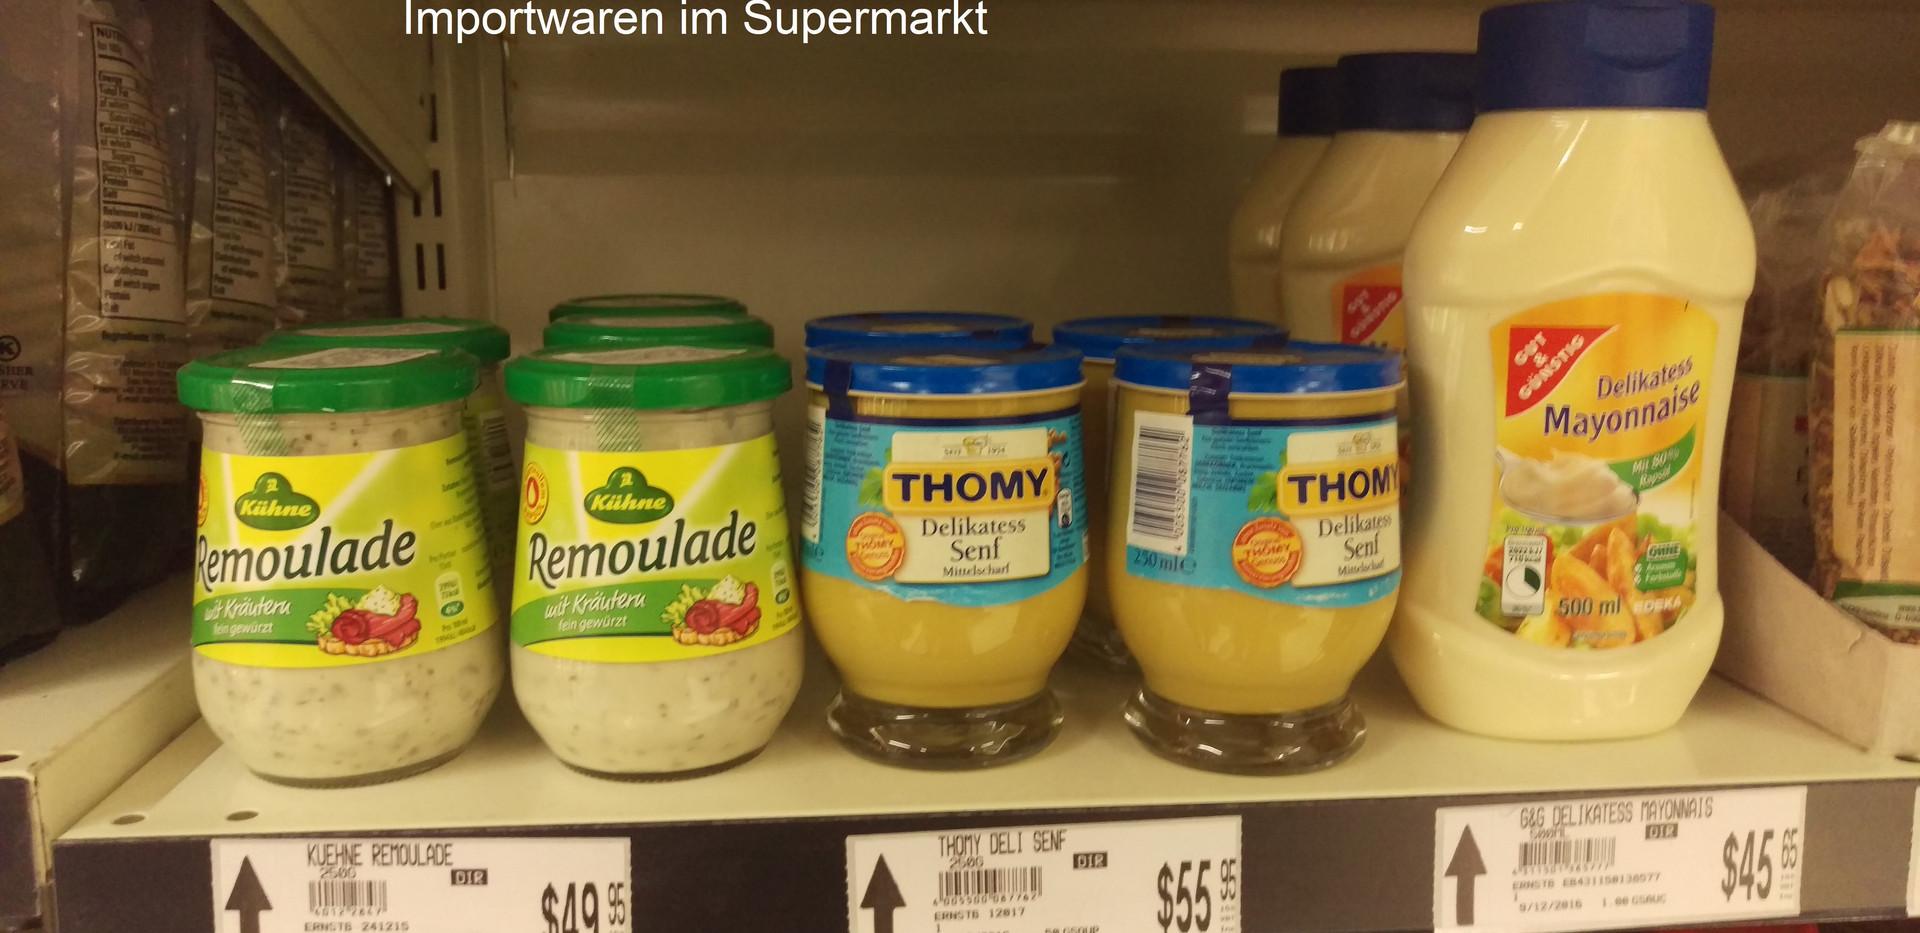 Supermarkt_beschriftet.jpg